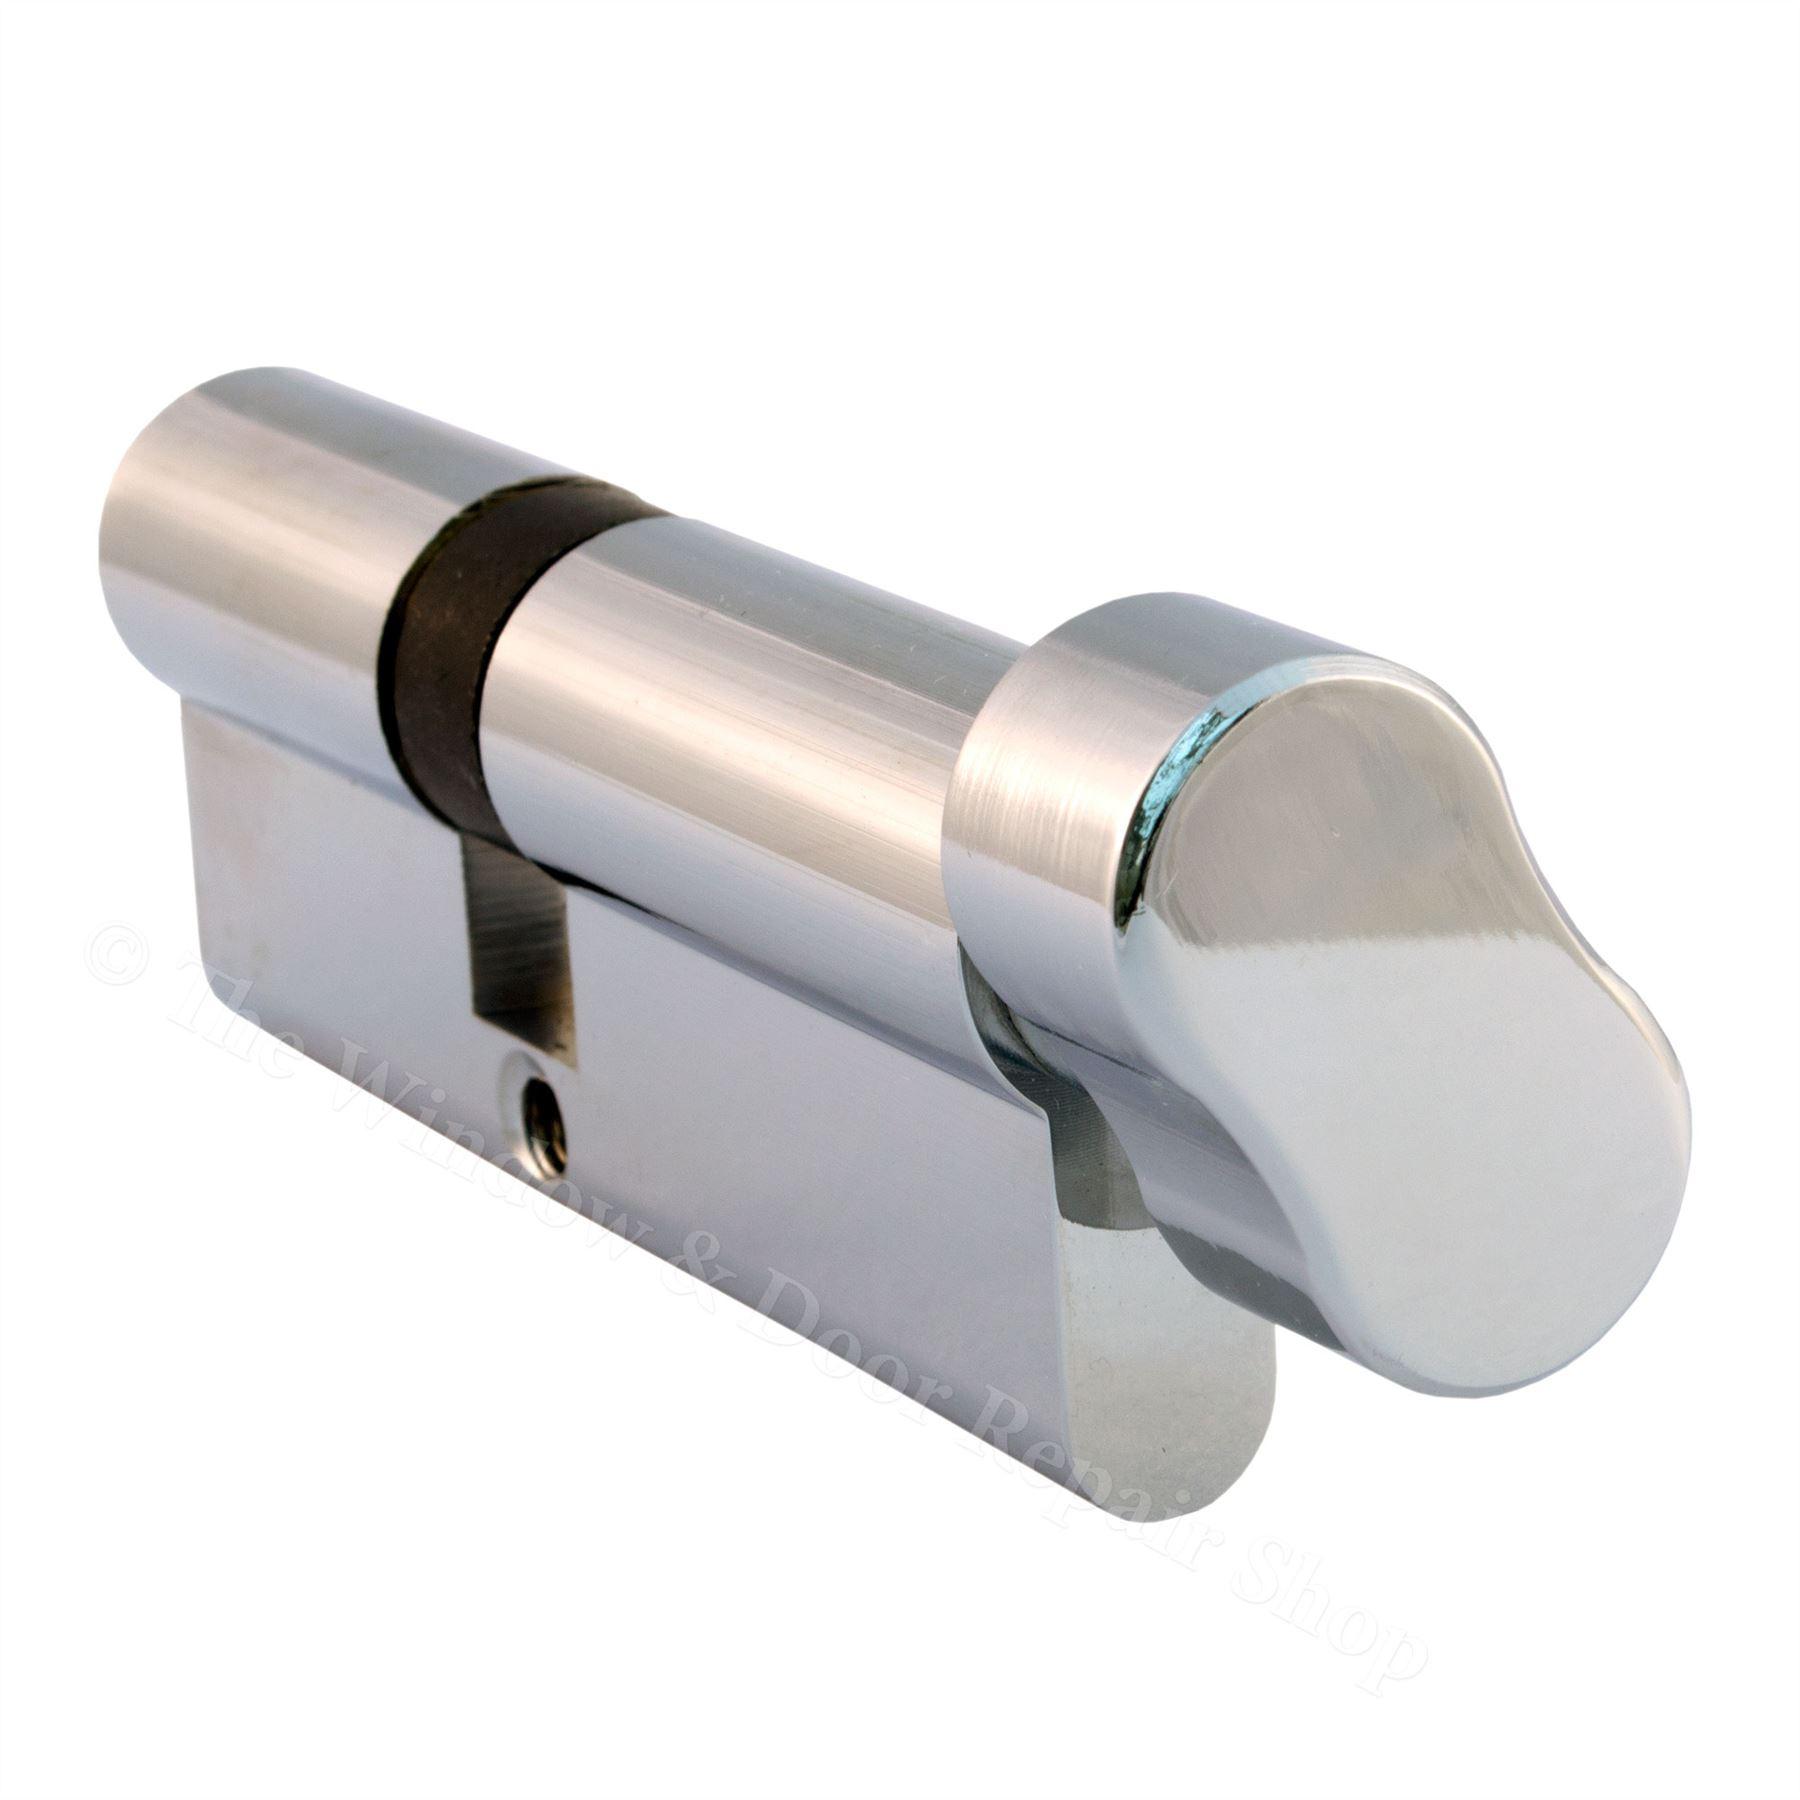 hight resolution of thumb turn cylinder euro barrel door lock upvc anti drill bs en 1303 diagram lock thumbturn